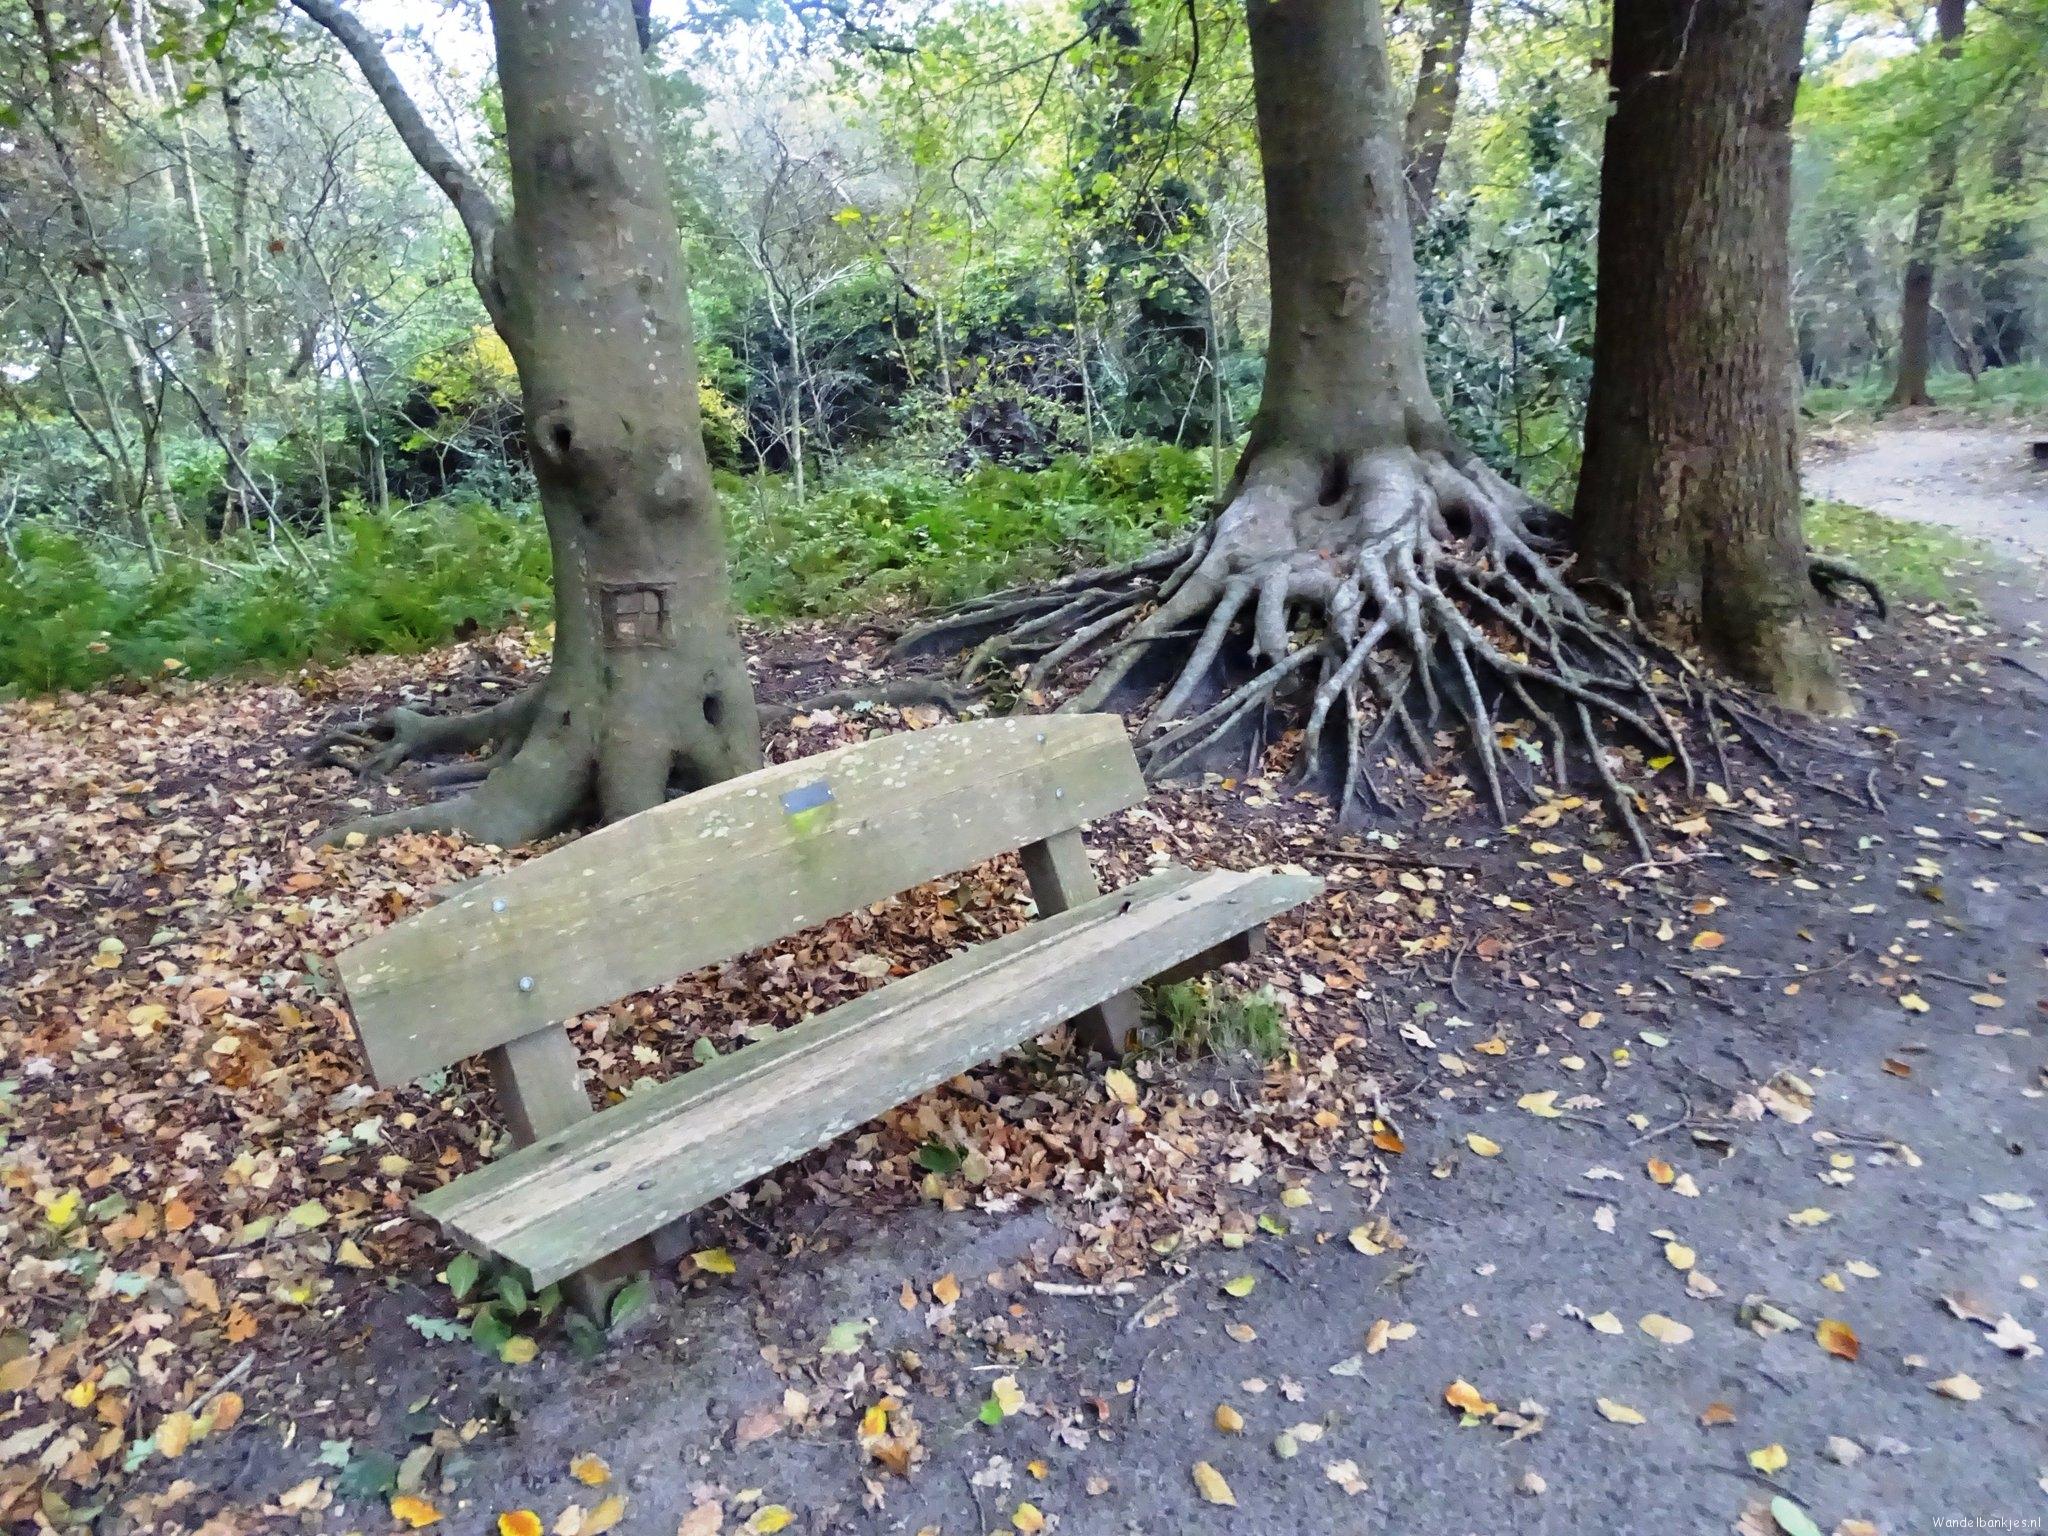 rt-jenjdevries-walking-benches-bench-in-fraeylemapark-slochteren-httpst-colokflewk2p